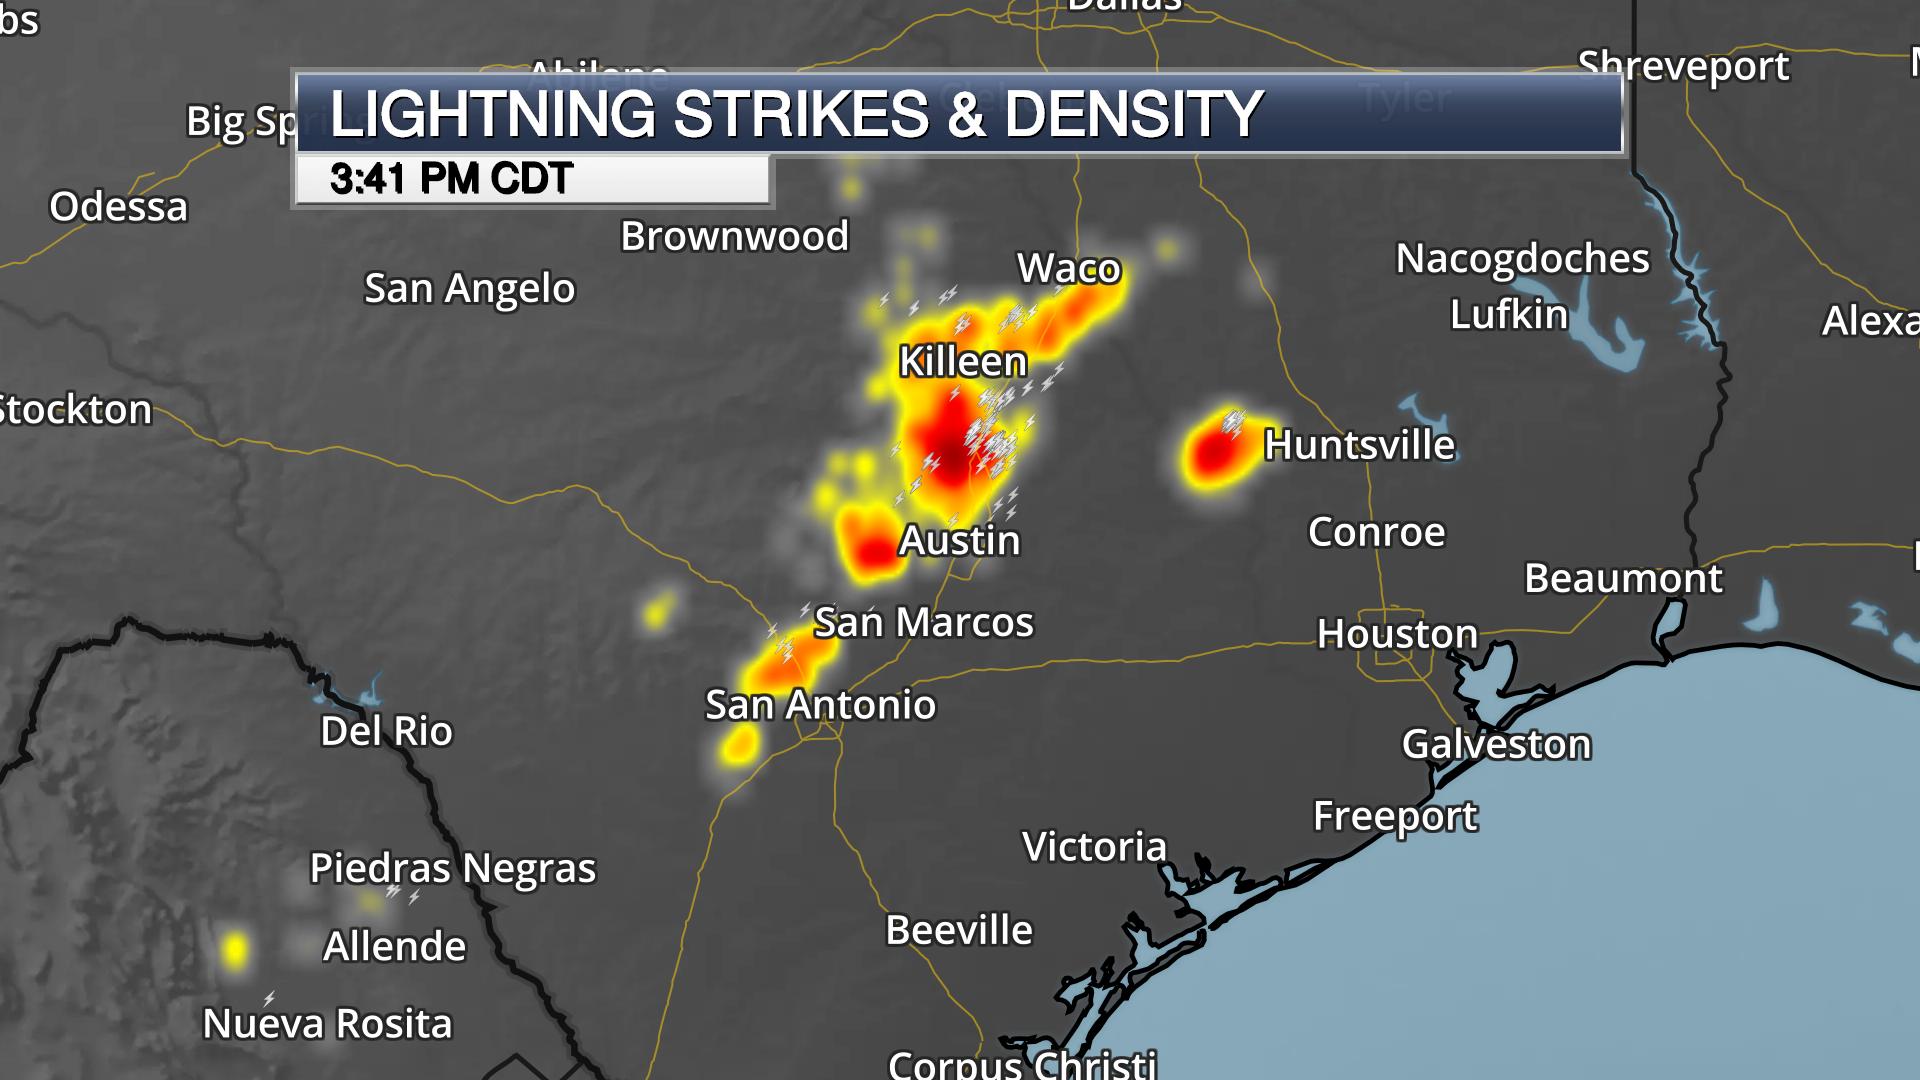 lightning density and lightning strike weather map on dark background